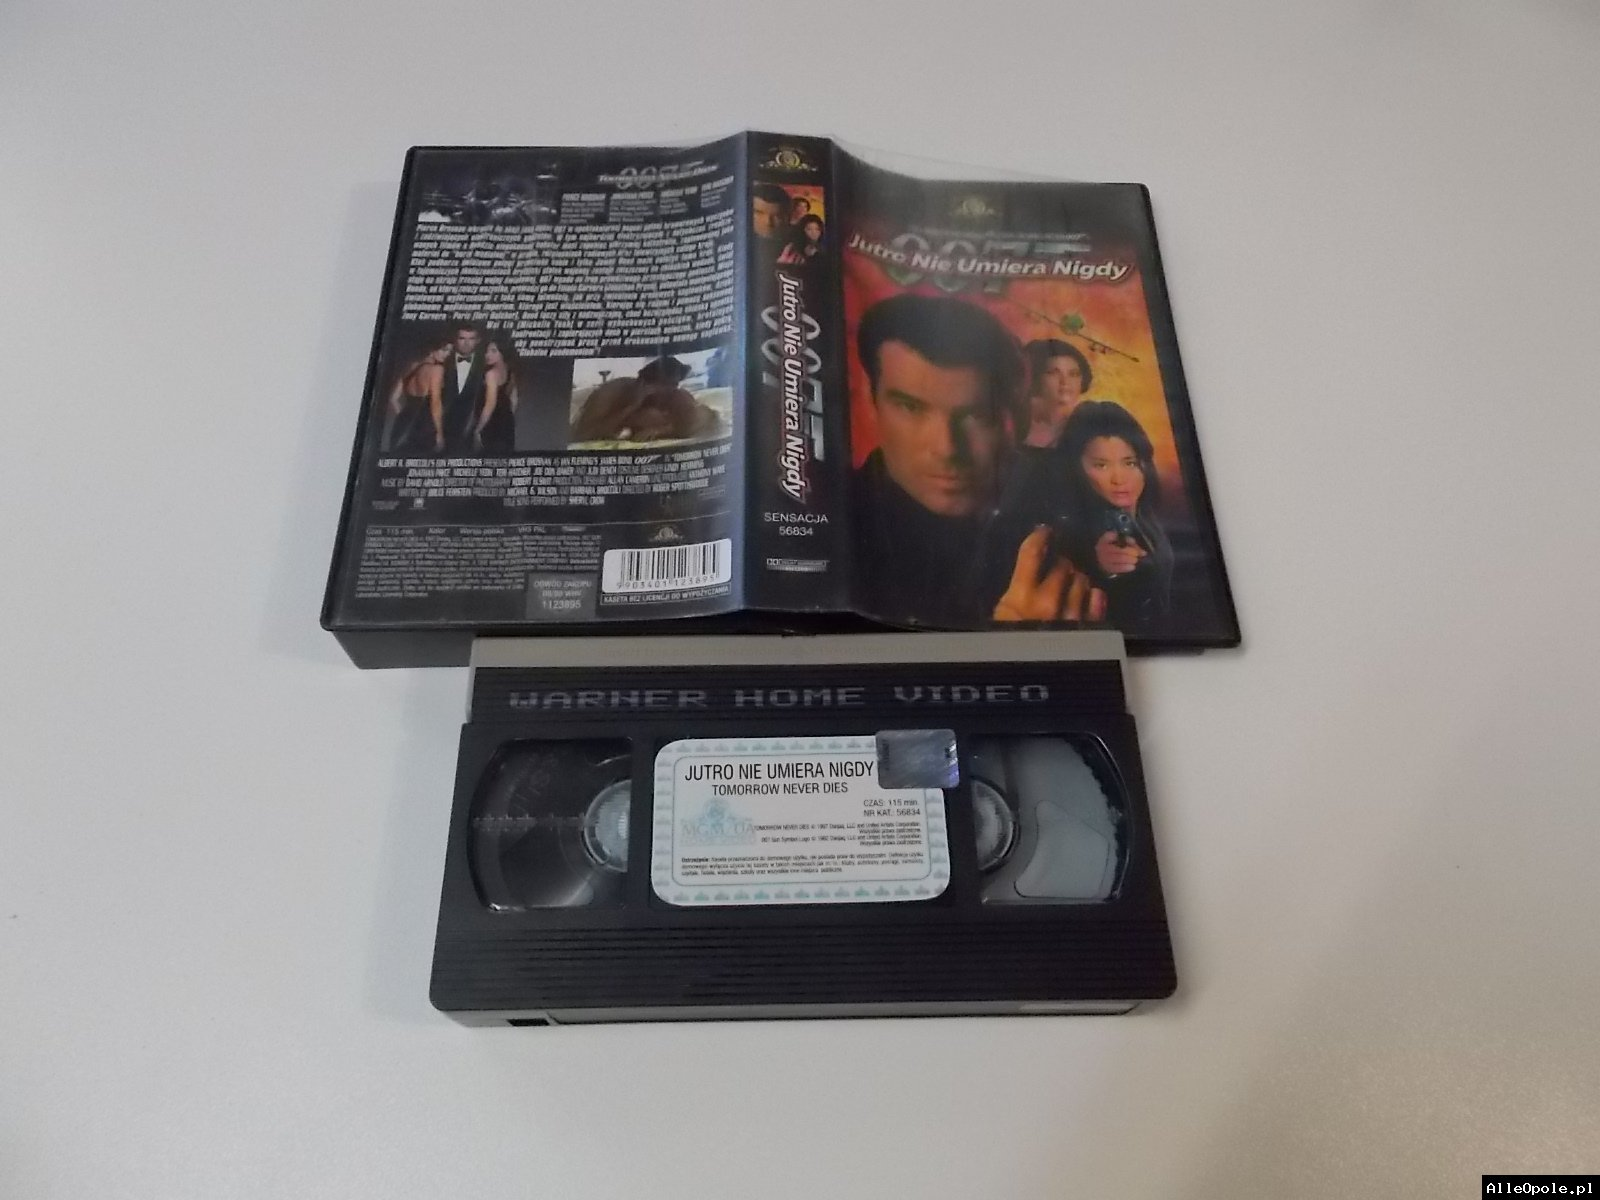 007 JUTRO NIE UMIERA NIGDY - VHS Kaseta Video - Opole 1713